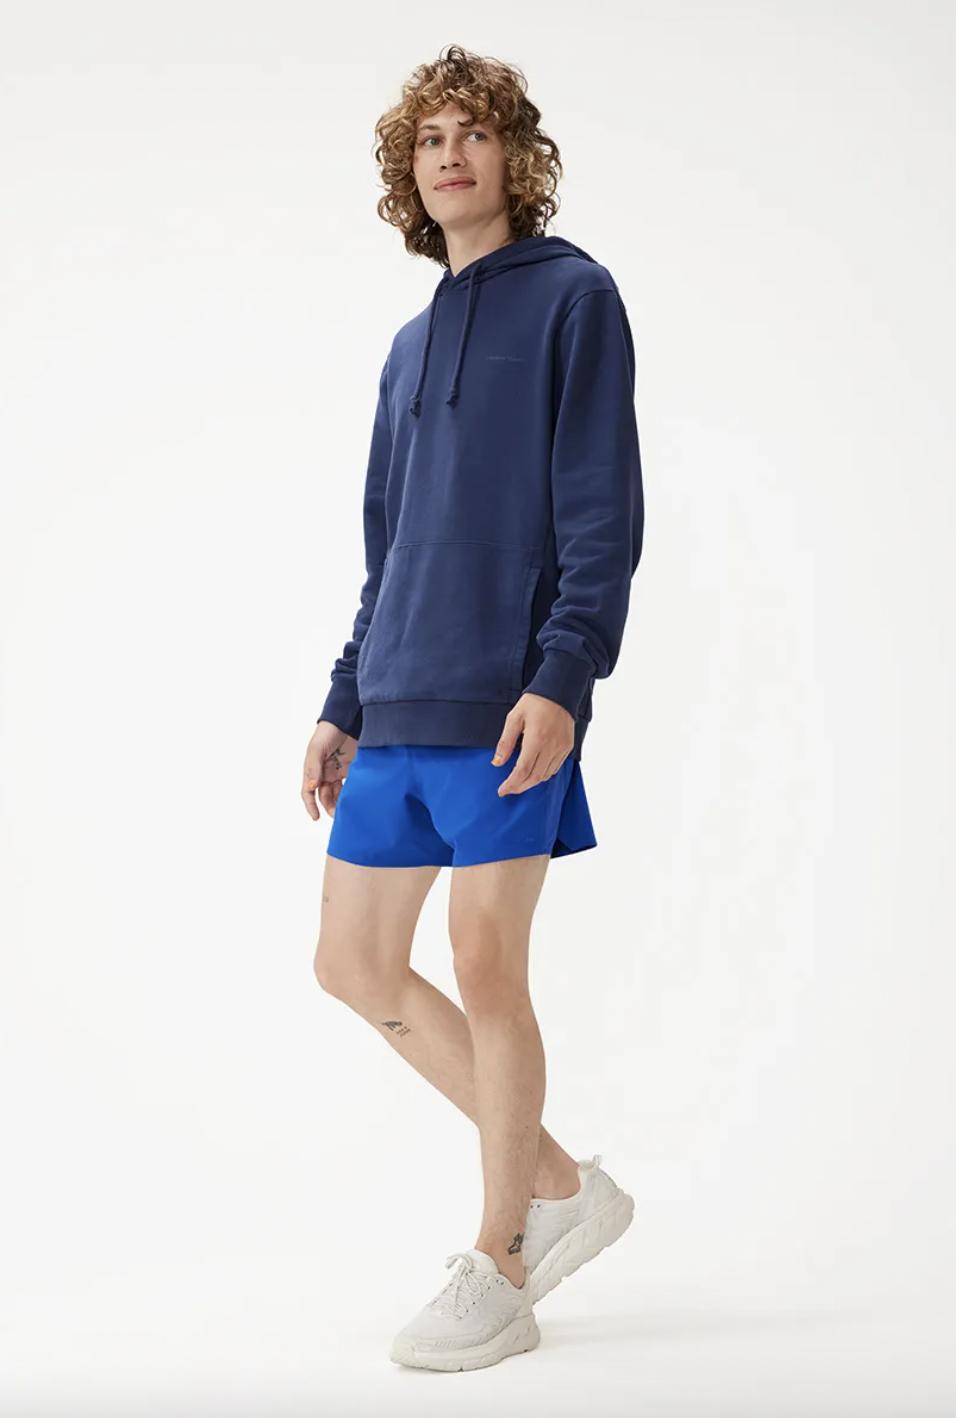 short shorts mens blue